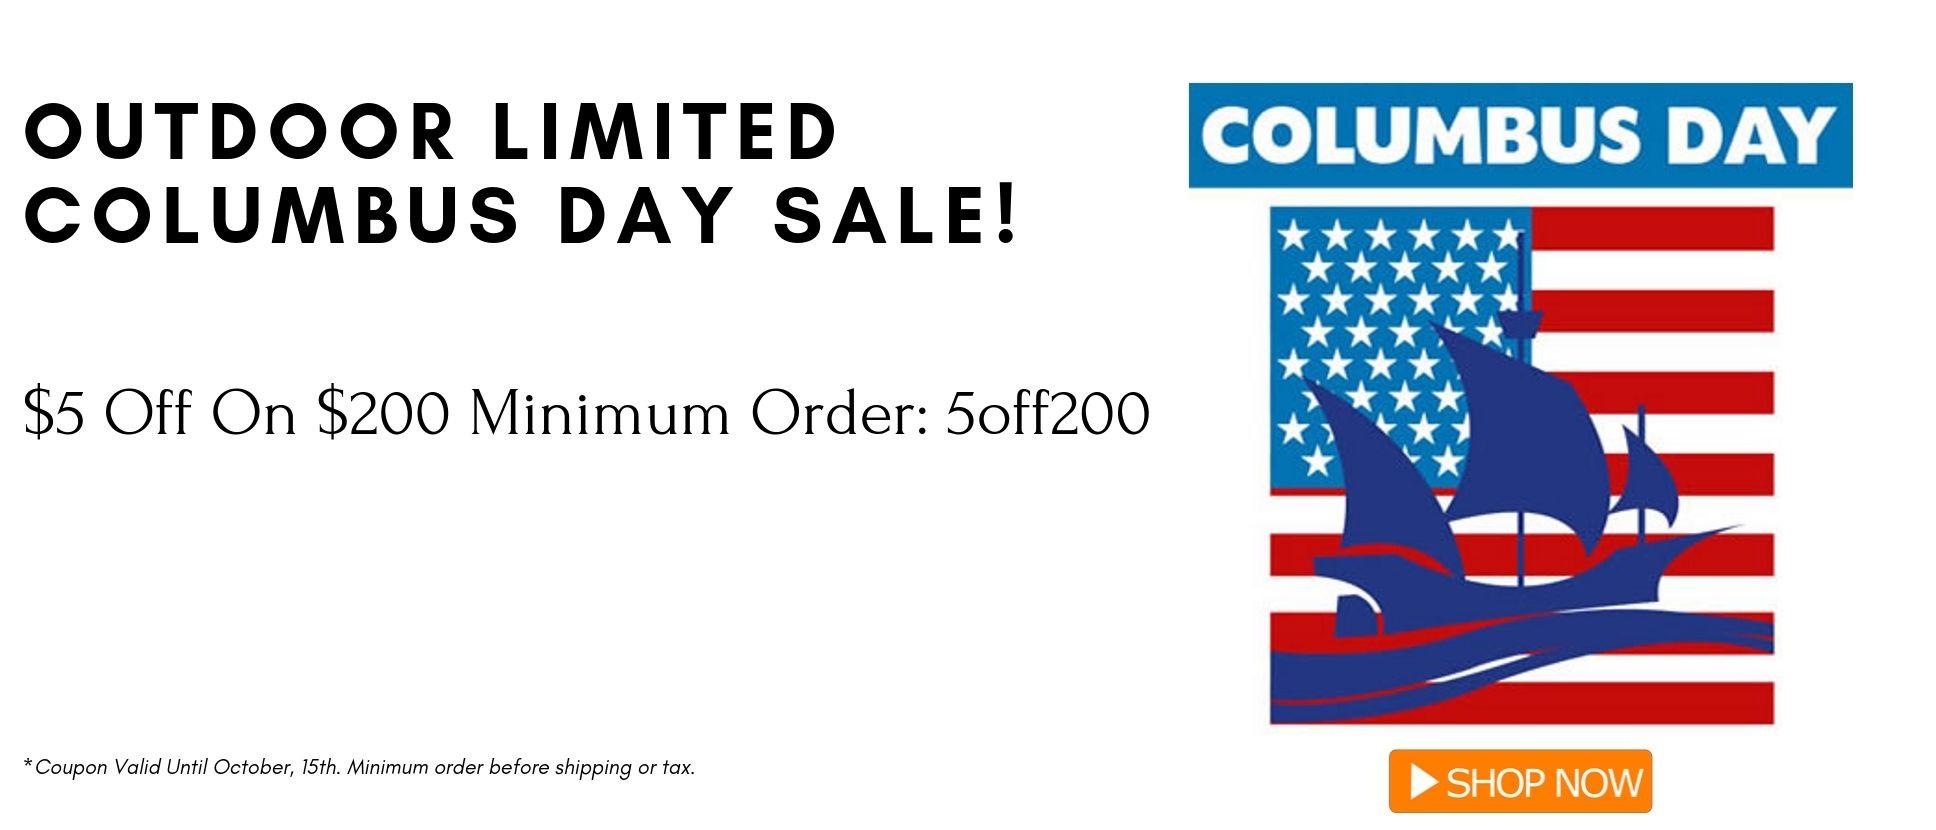 columbus-day-sale-large.jpg